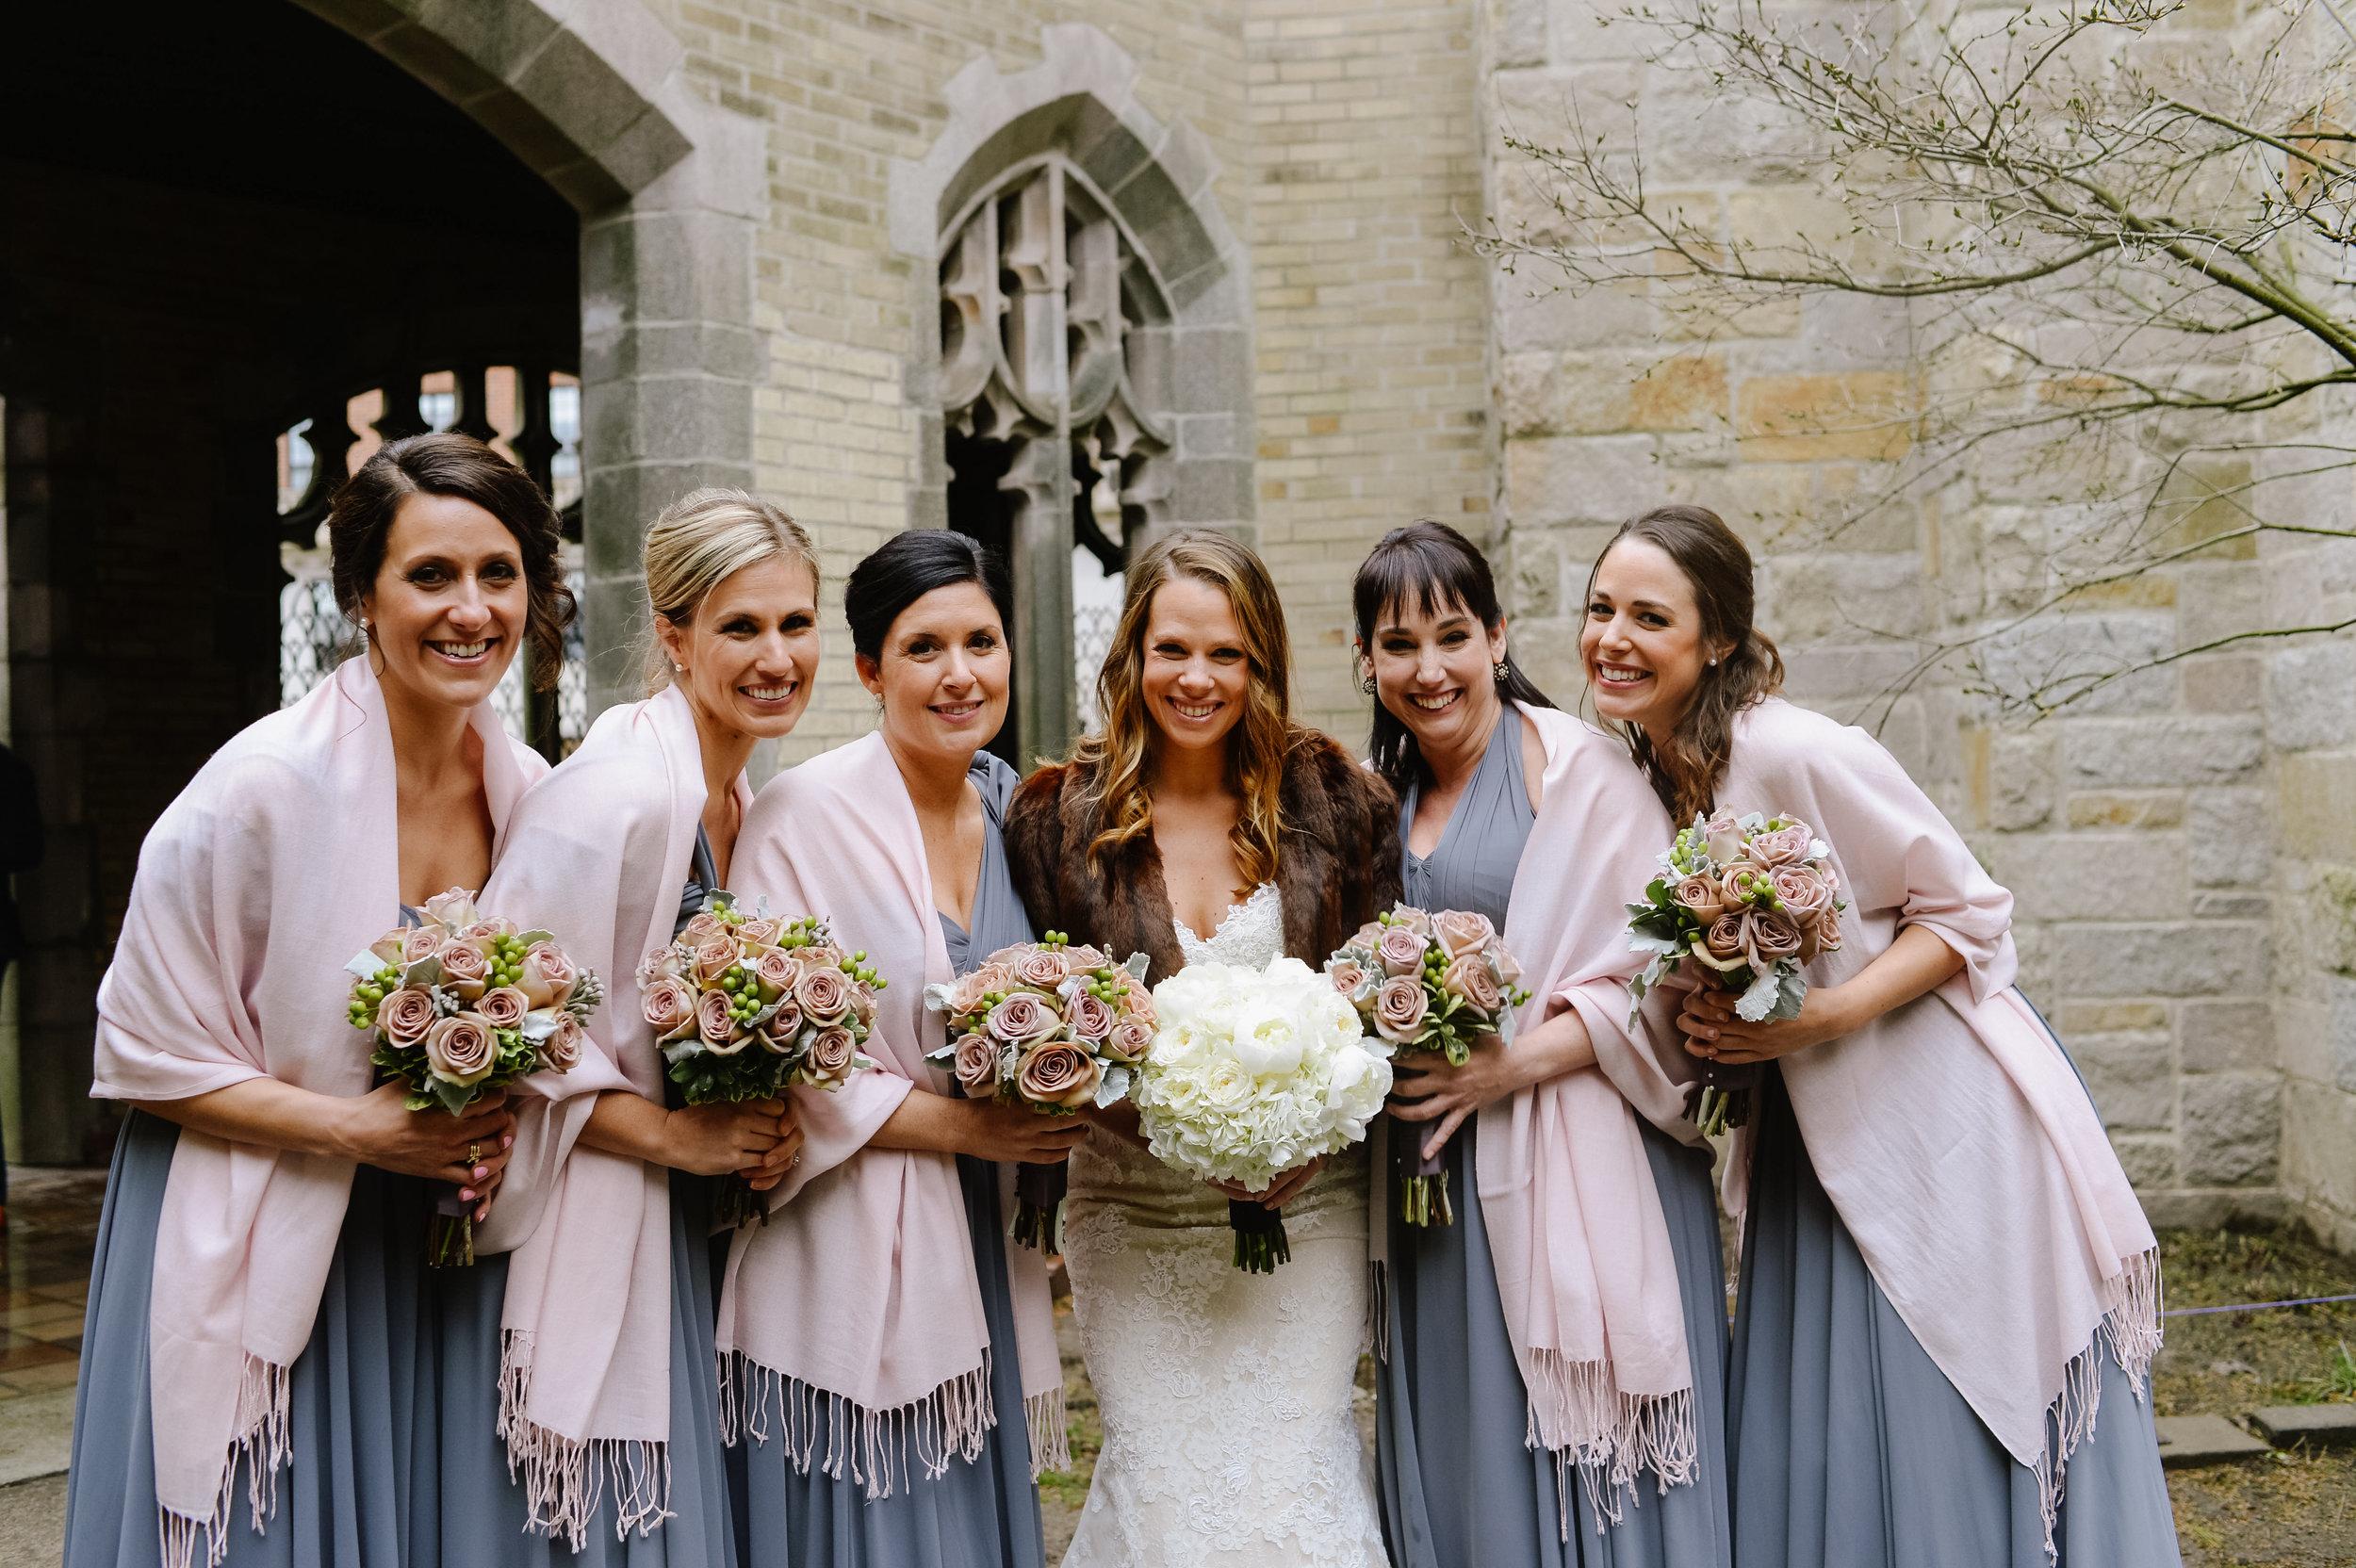 Westin-Harborview-Maine-Wedding021.jpg